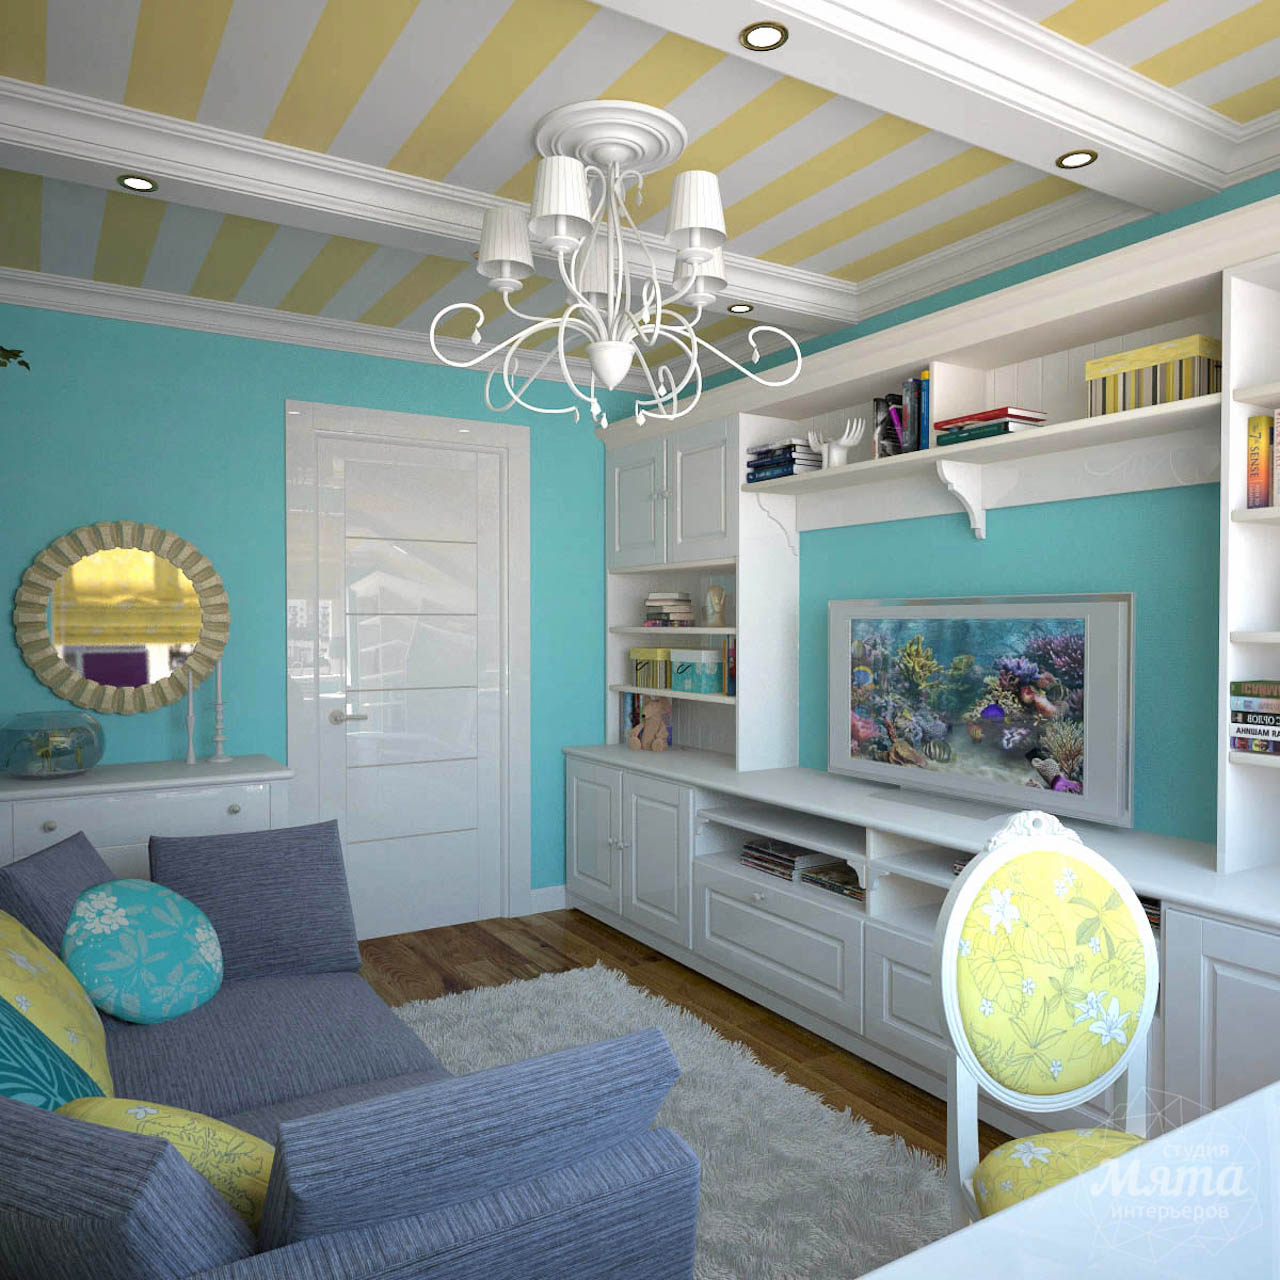 Дизайн интерьера двухкомнатной квартиры по ул. Комсомольская 14 img1711287617